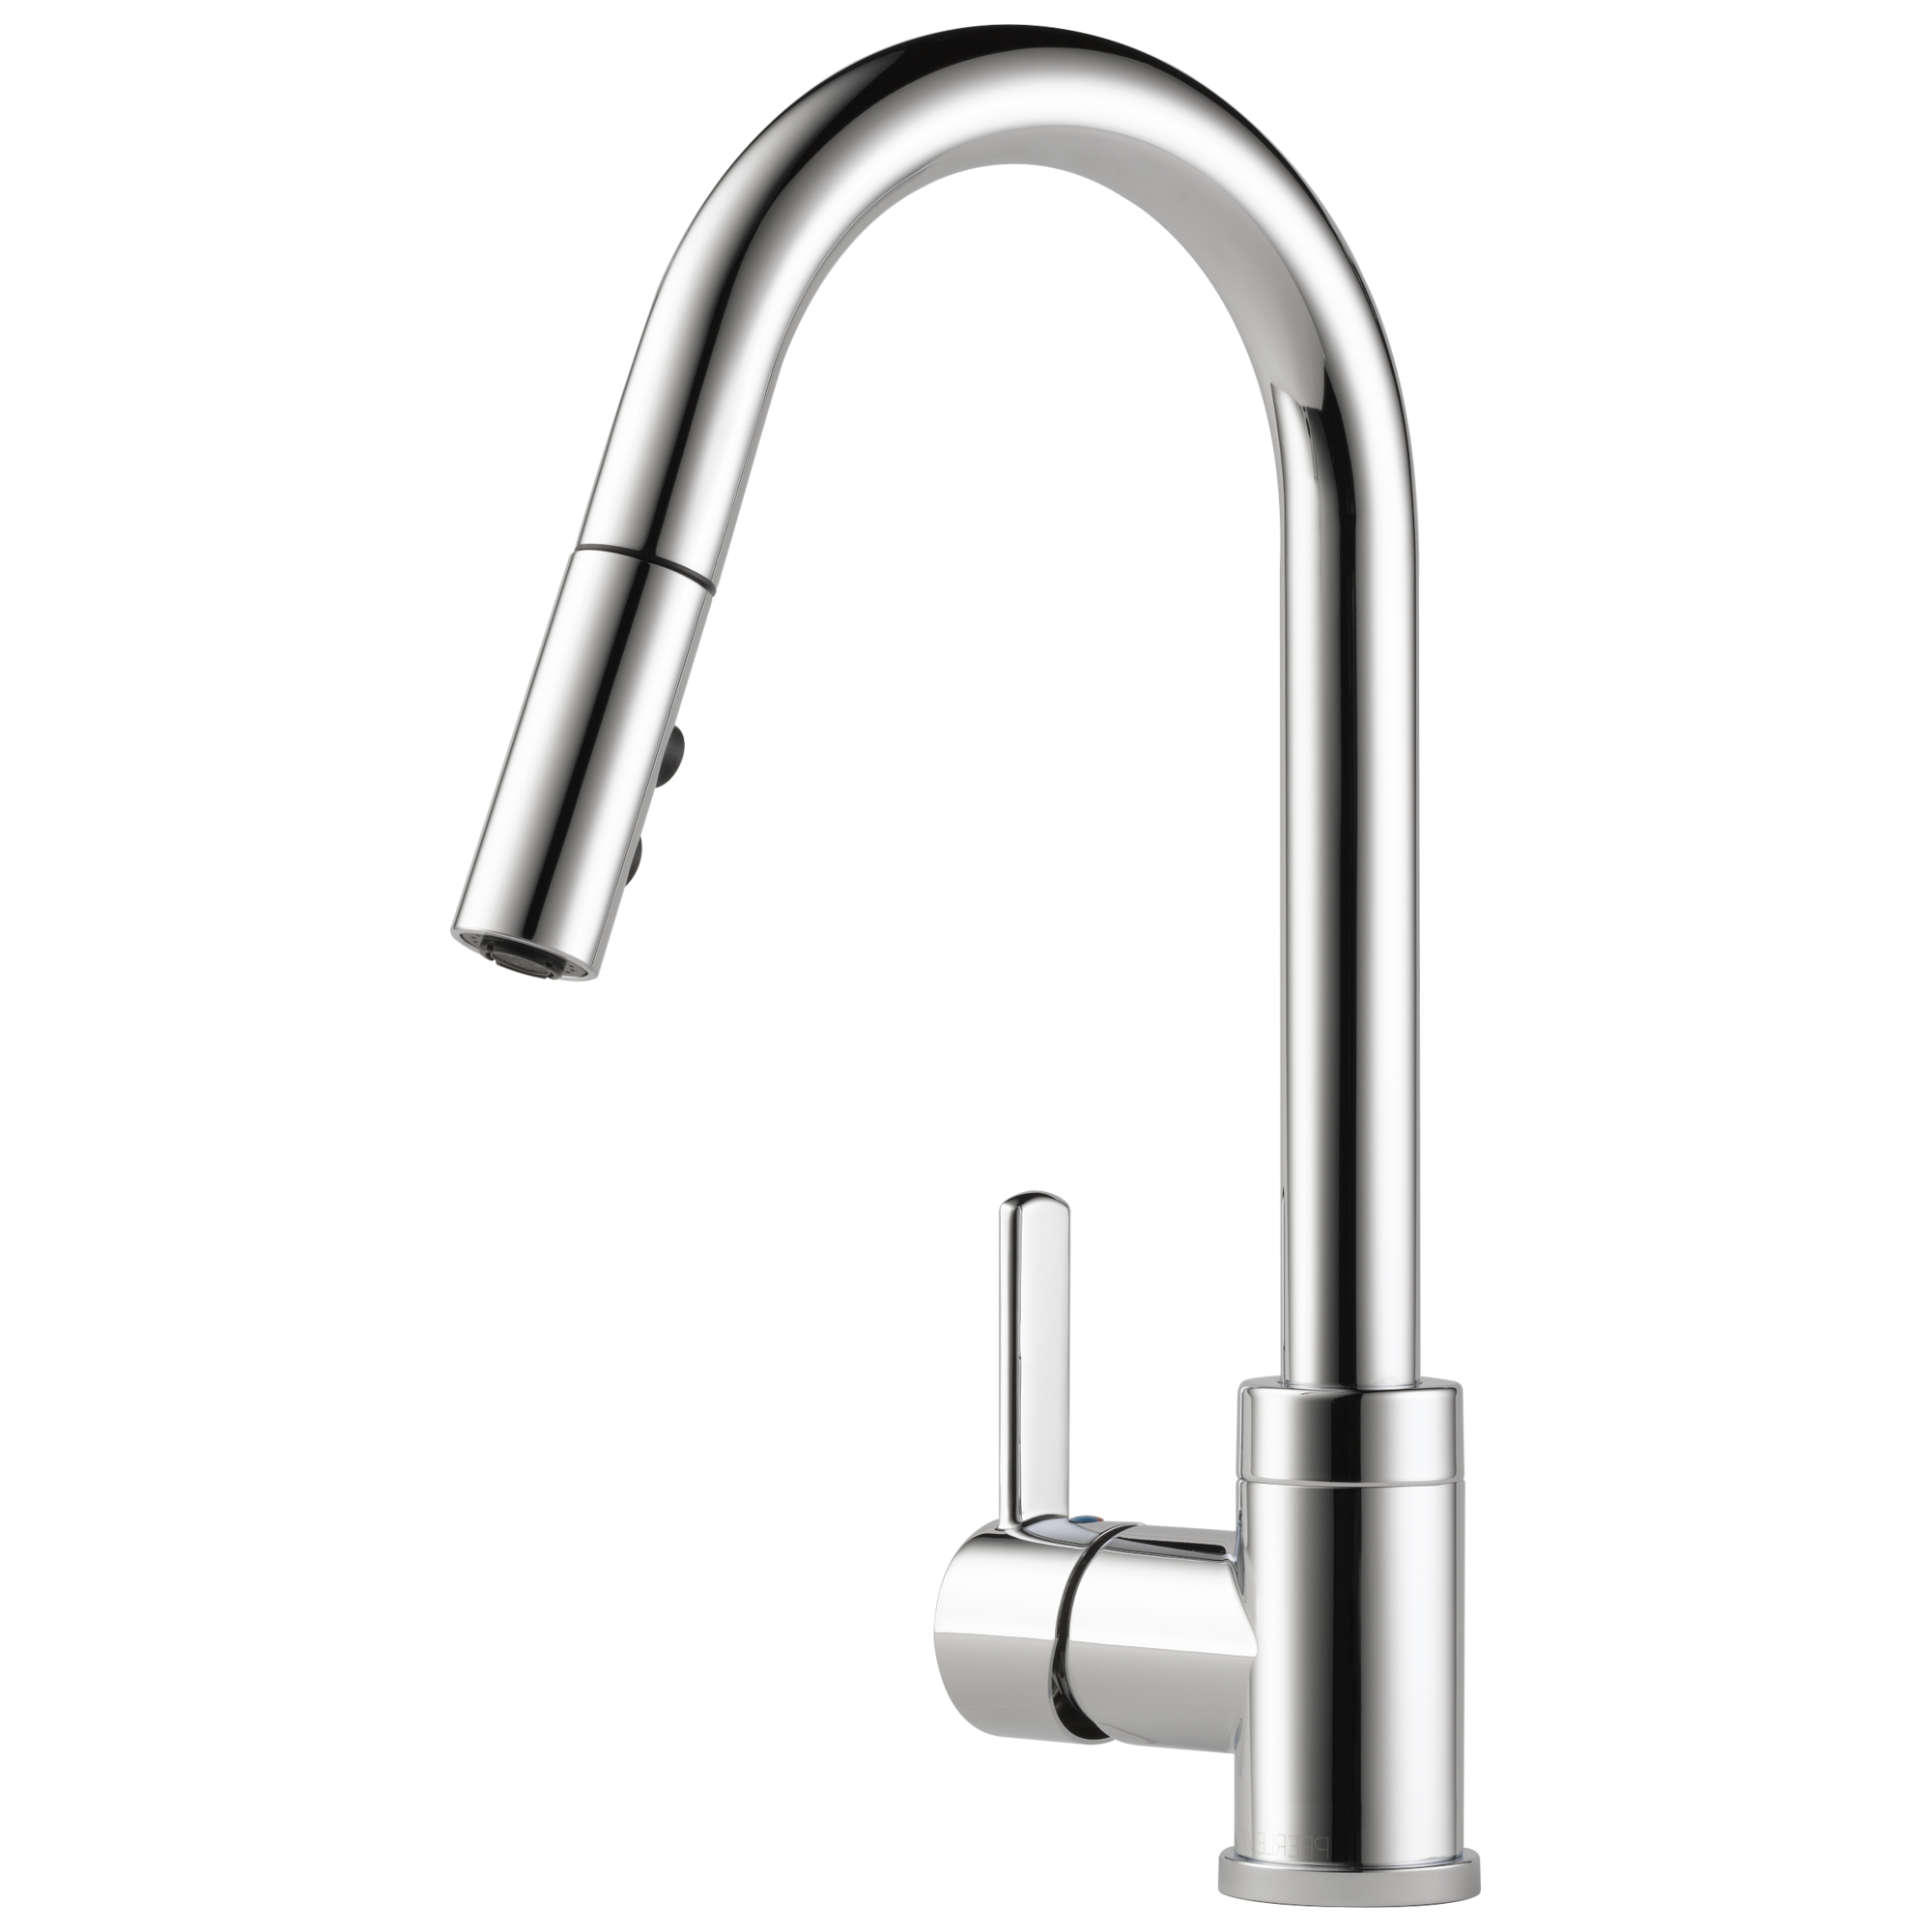 peerless faucet from Kitchen Tap Accessories | hondudiariohn.com ...